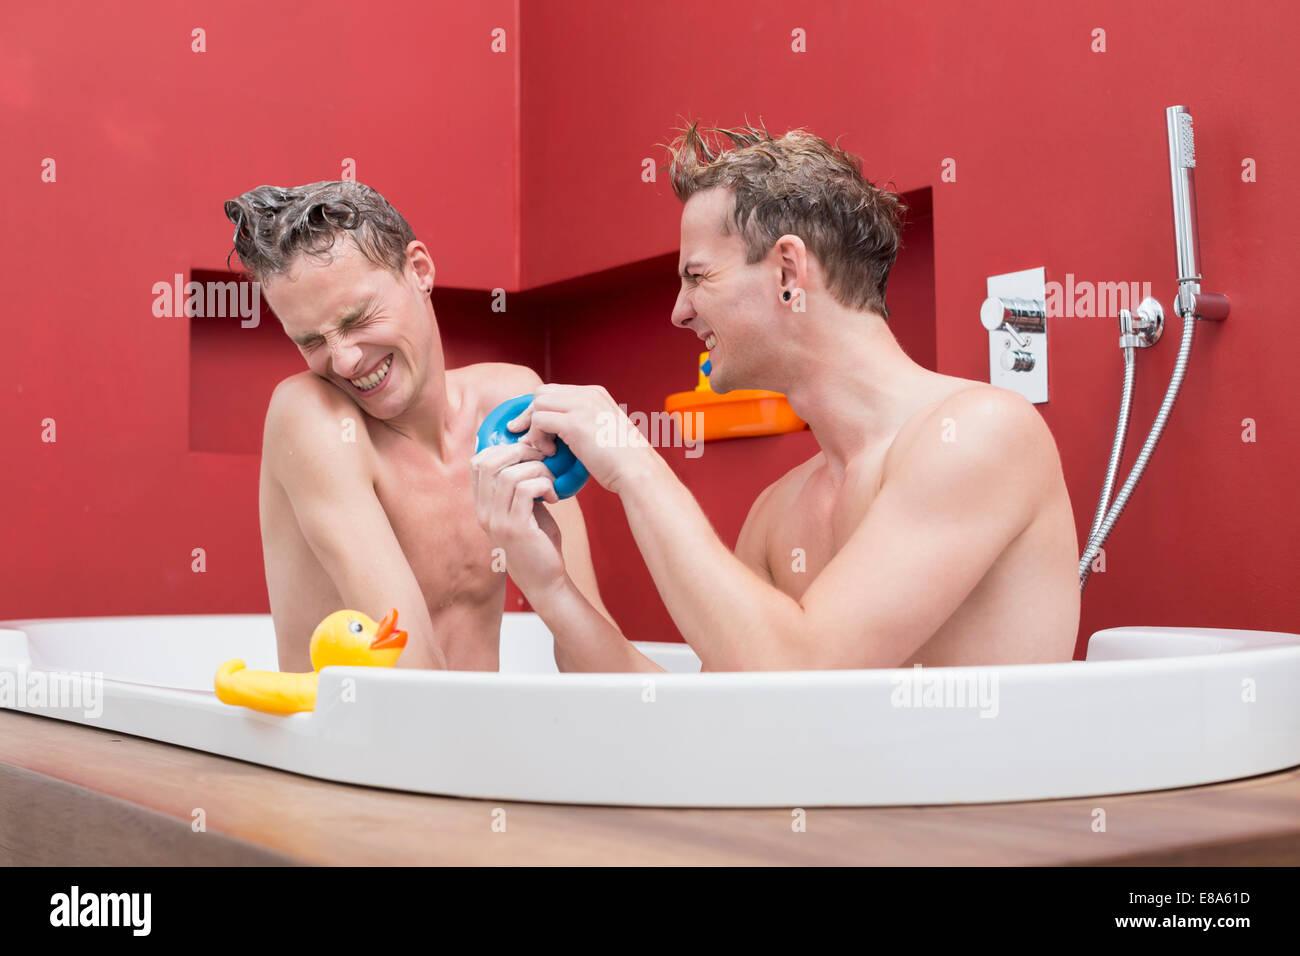 Homosexual Couple Having Fun In Bathtub Smiling Stock Photo